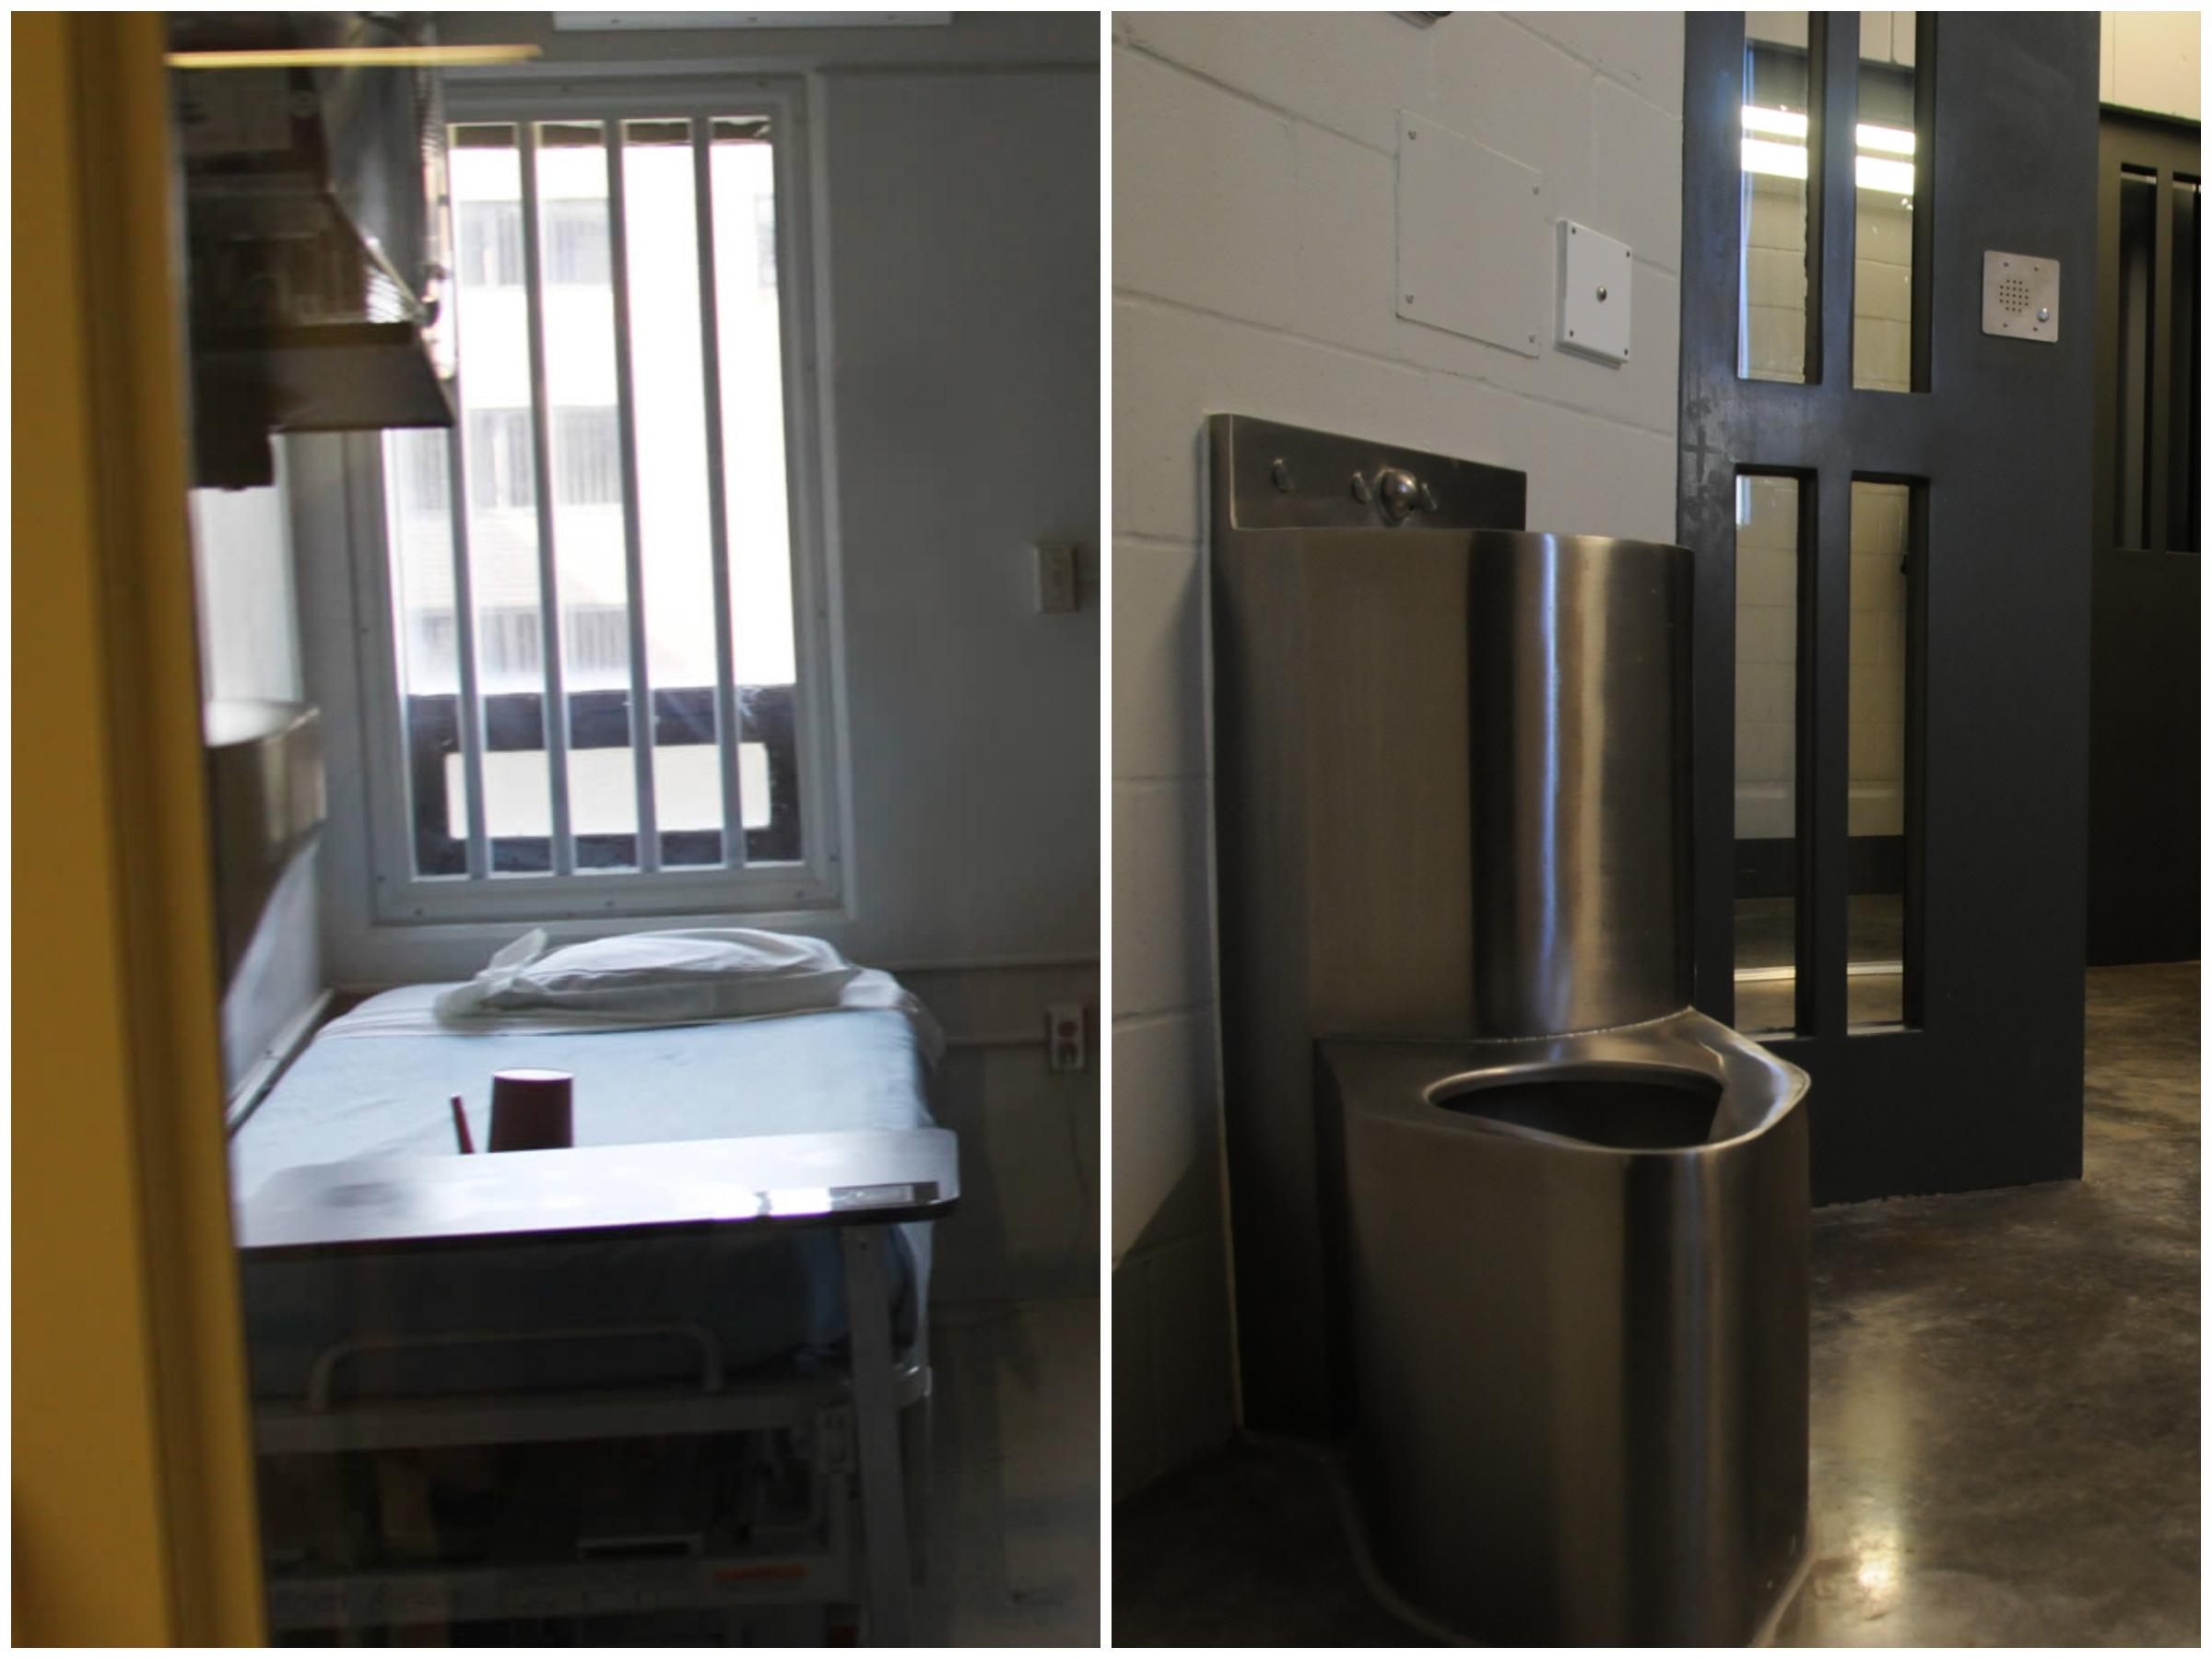 Where Is Derek Chauvin Now? See Inside Oak Park Heights Prison